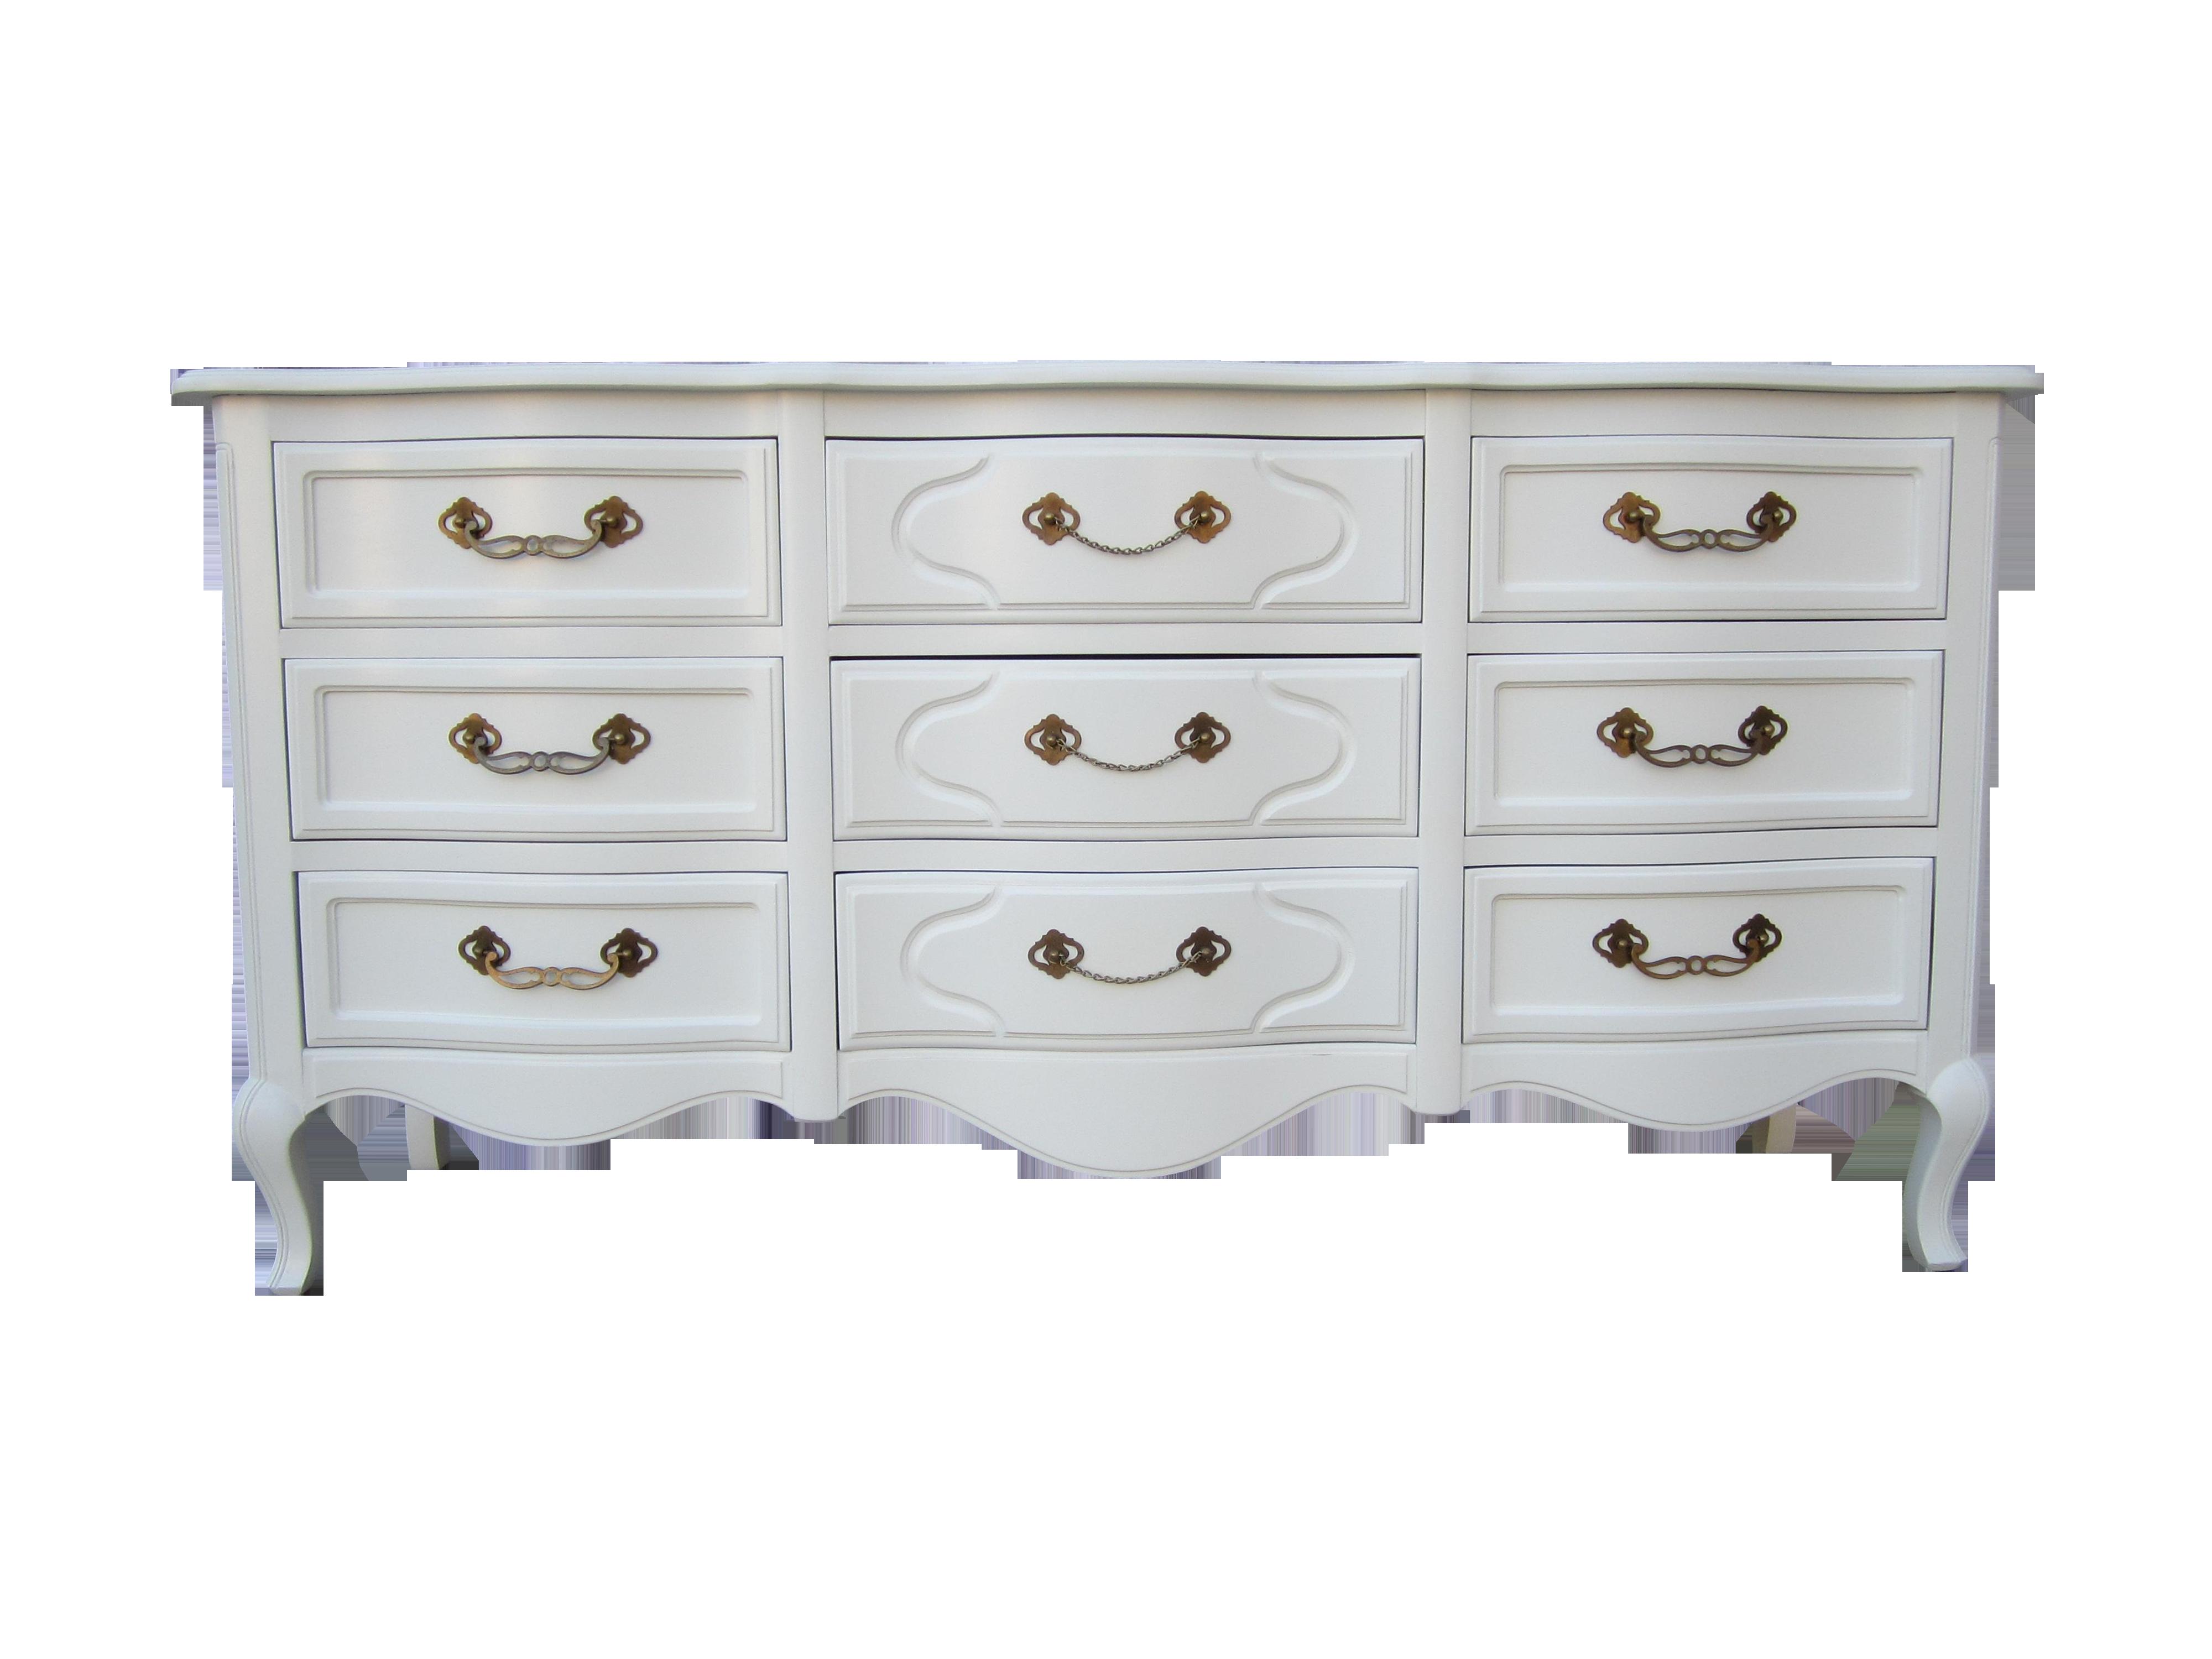 Drexel White Vintage French Country Dresser Chairish